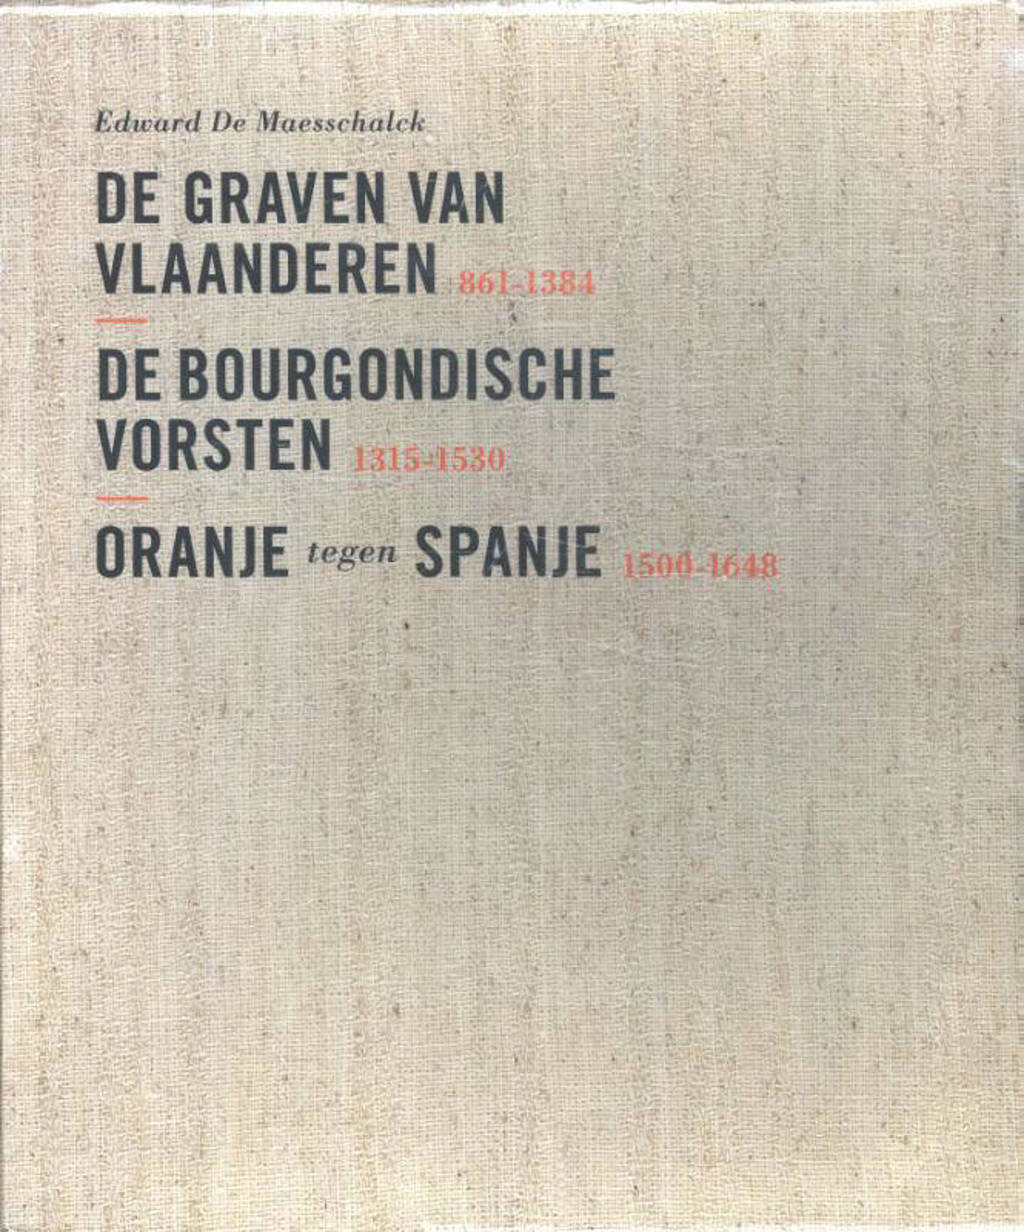 Oranje tegen Spanje - Edward De Maesschalck